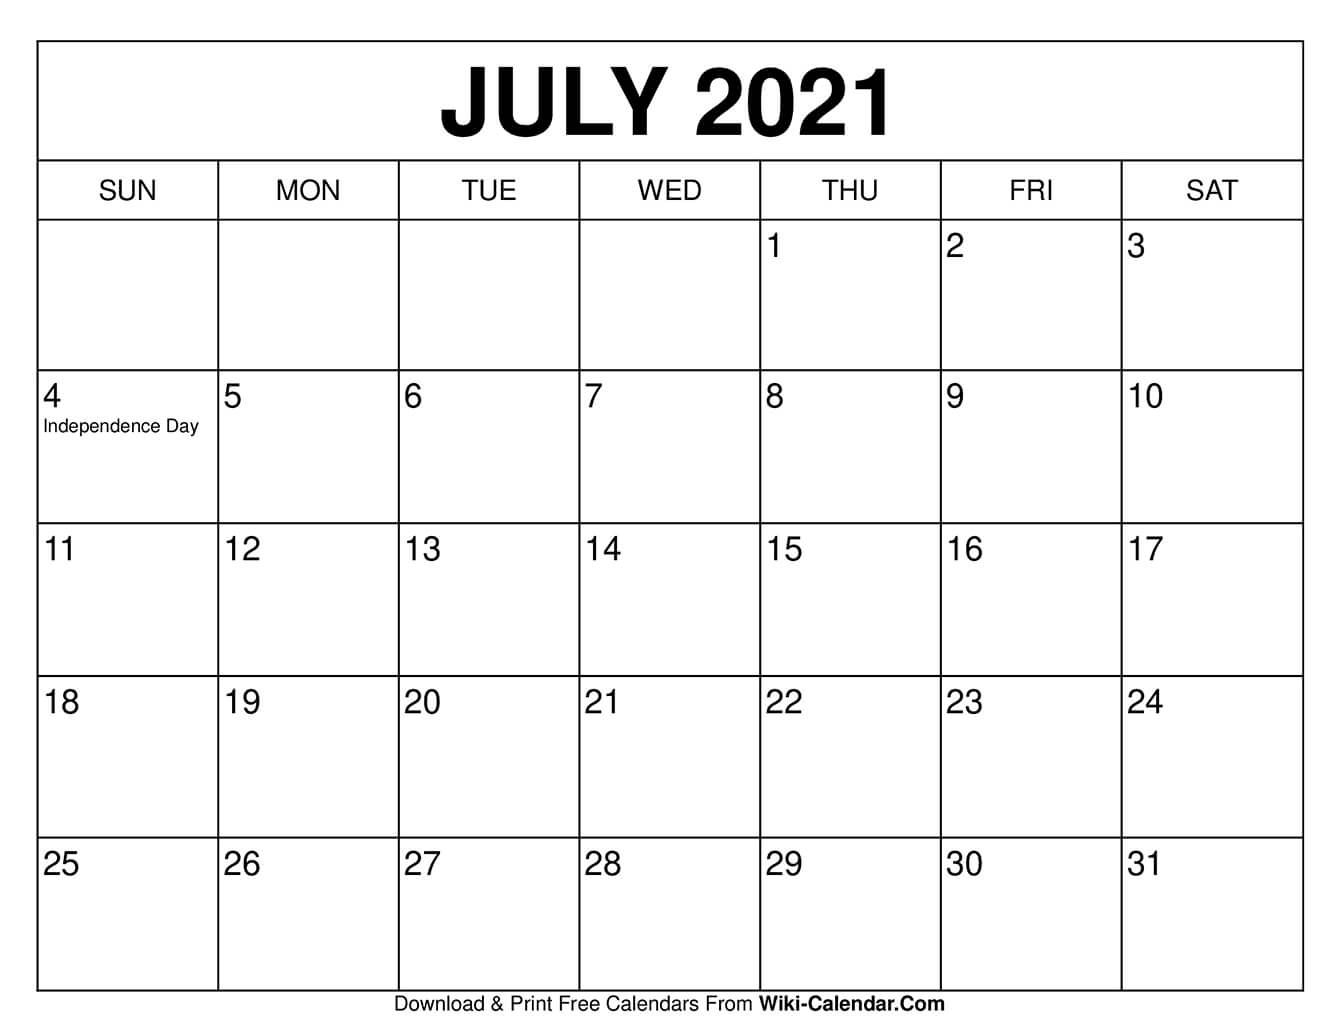 July 2021 Calendar In 2020 | Free Calendars To Print, Blank